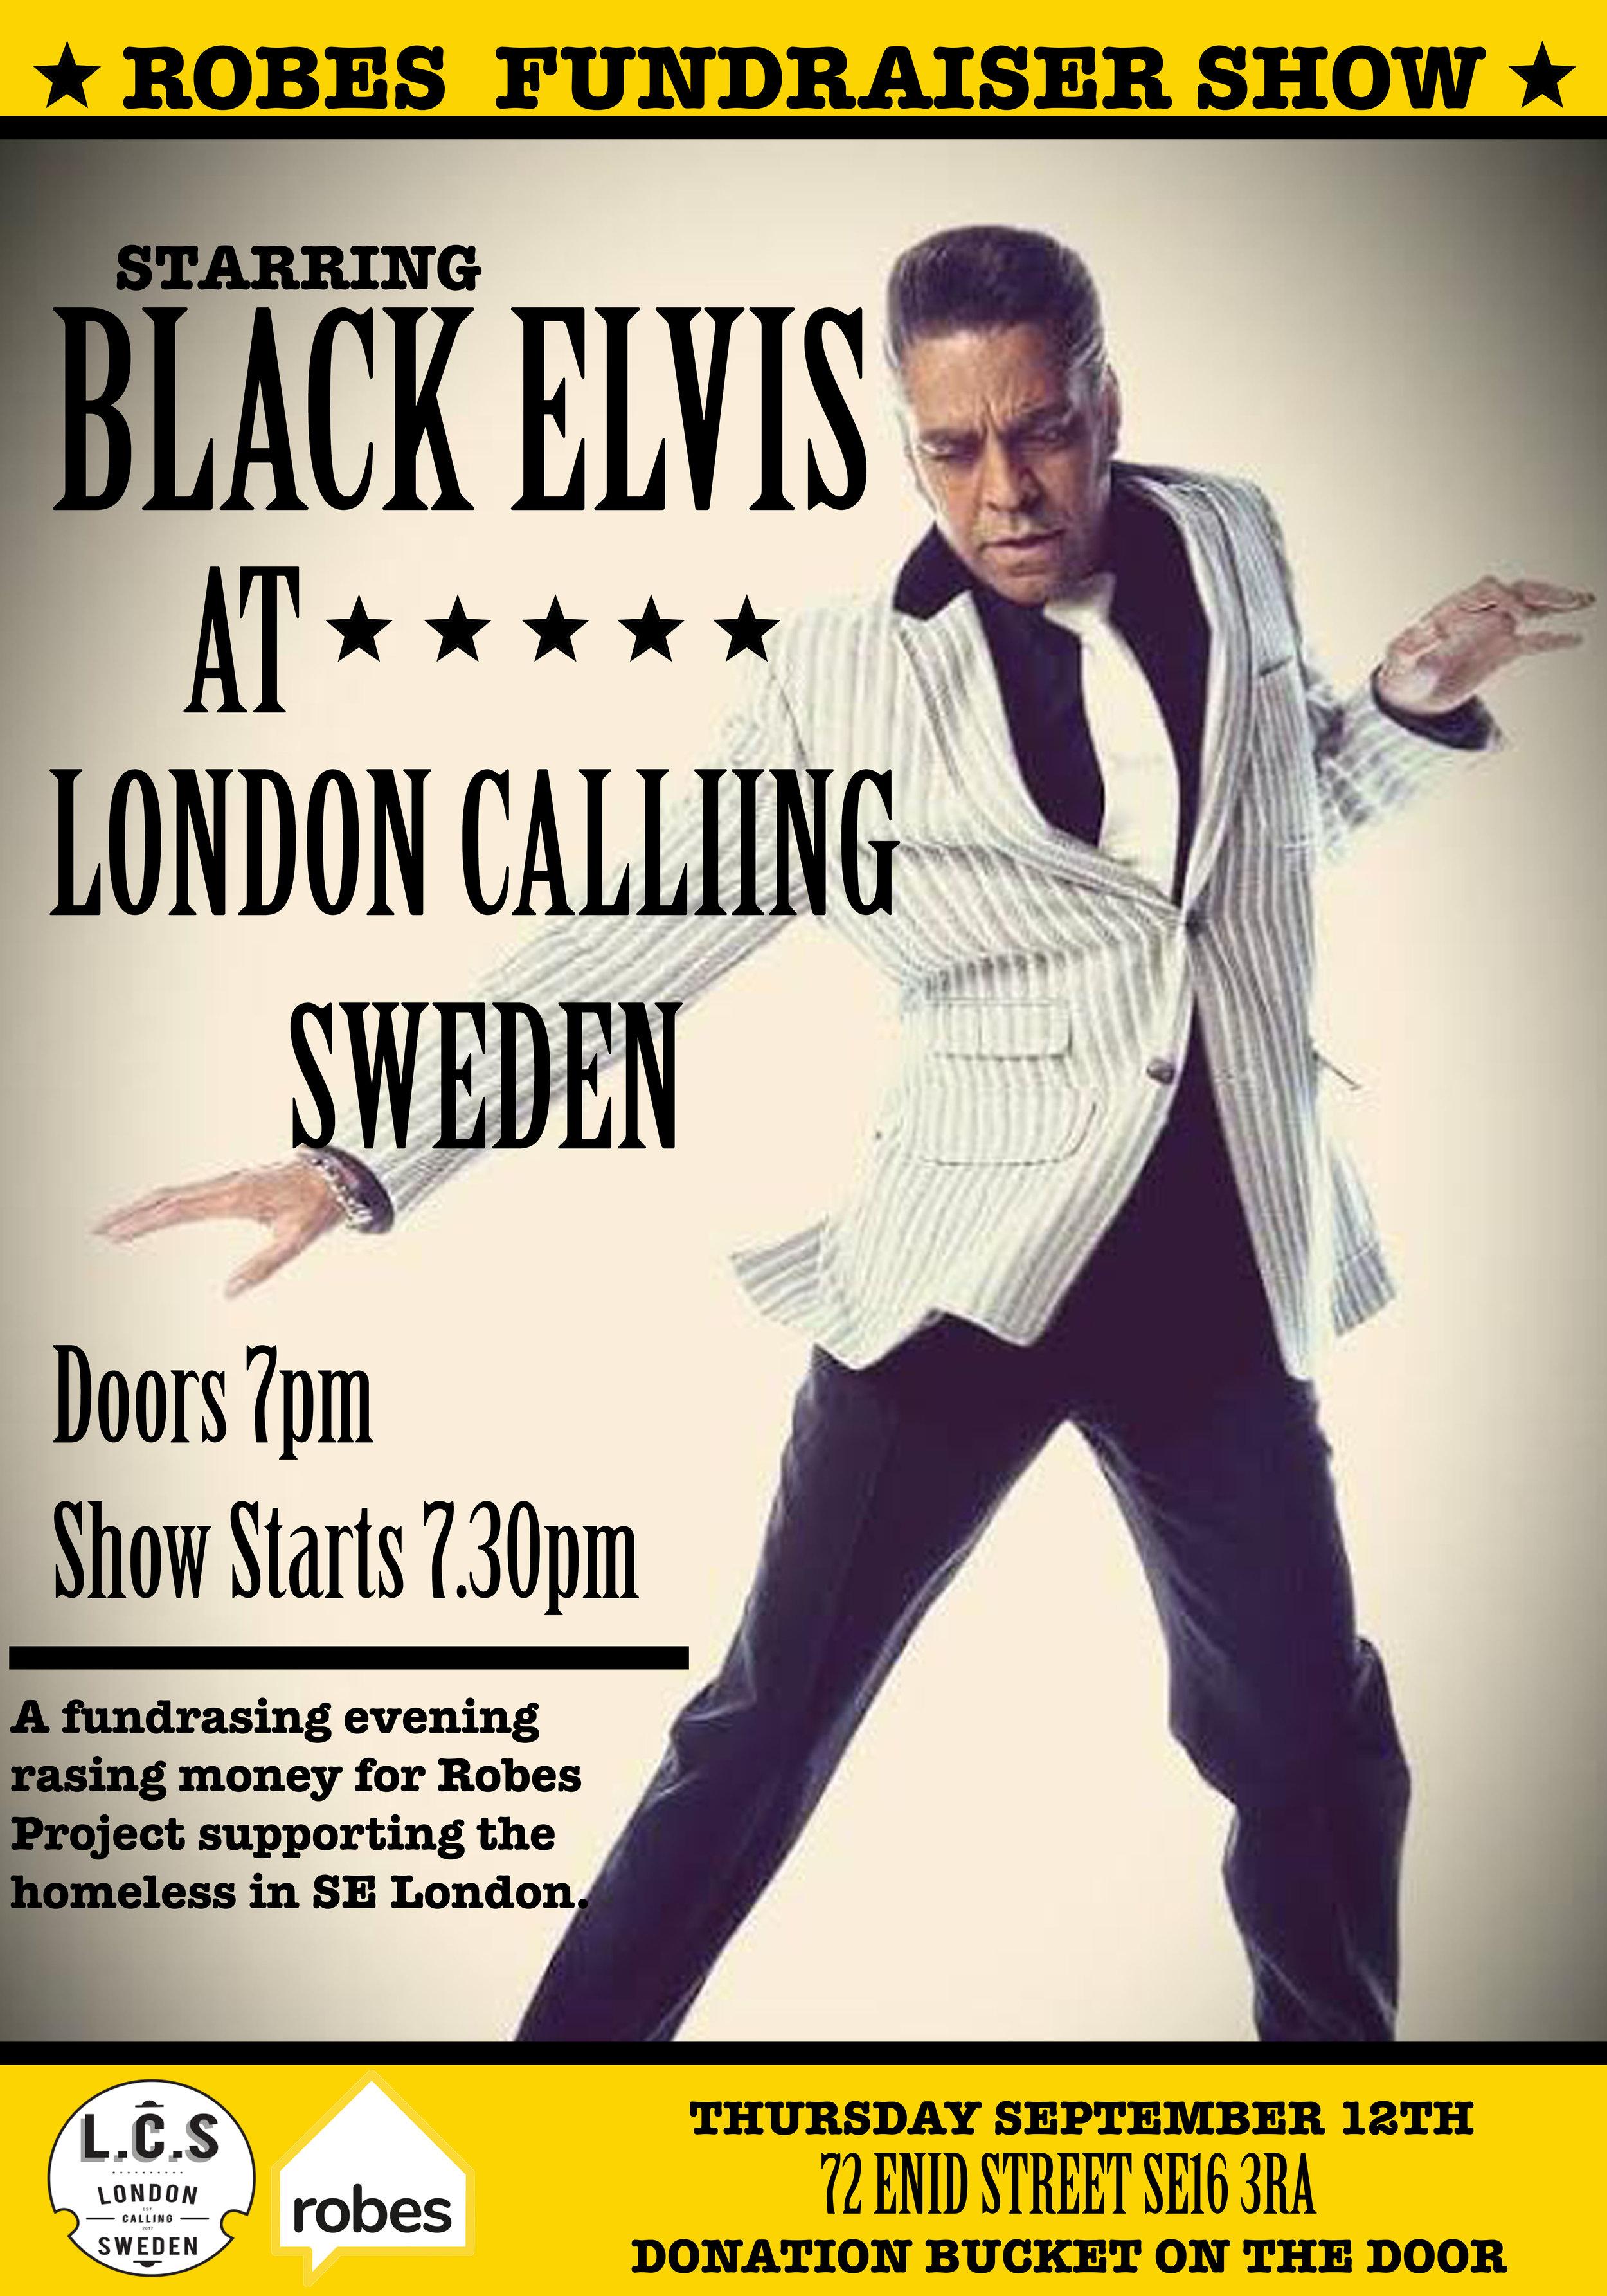 BLACK ELVIS POSTER.jpg